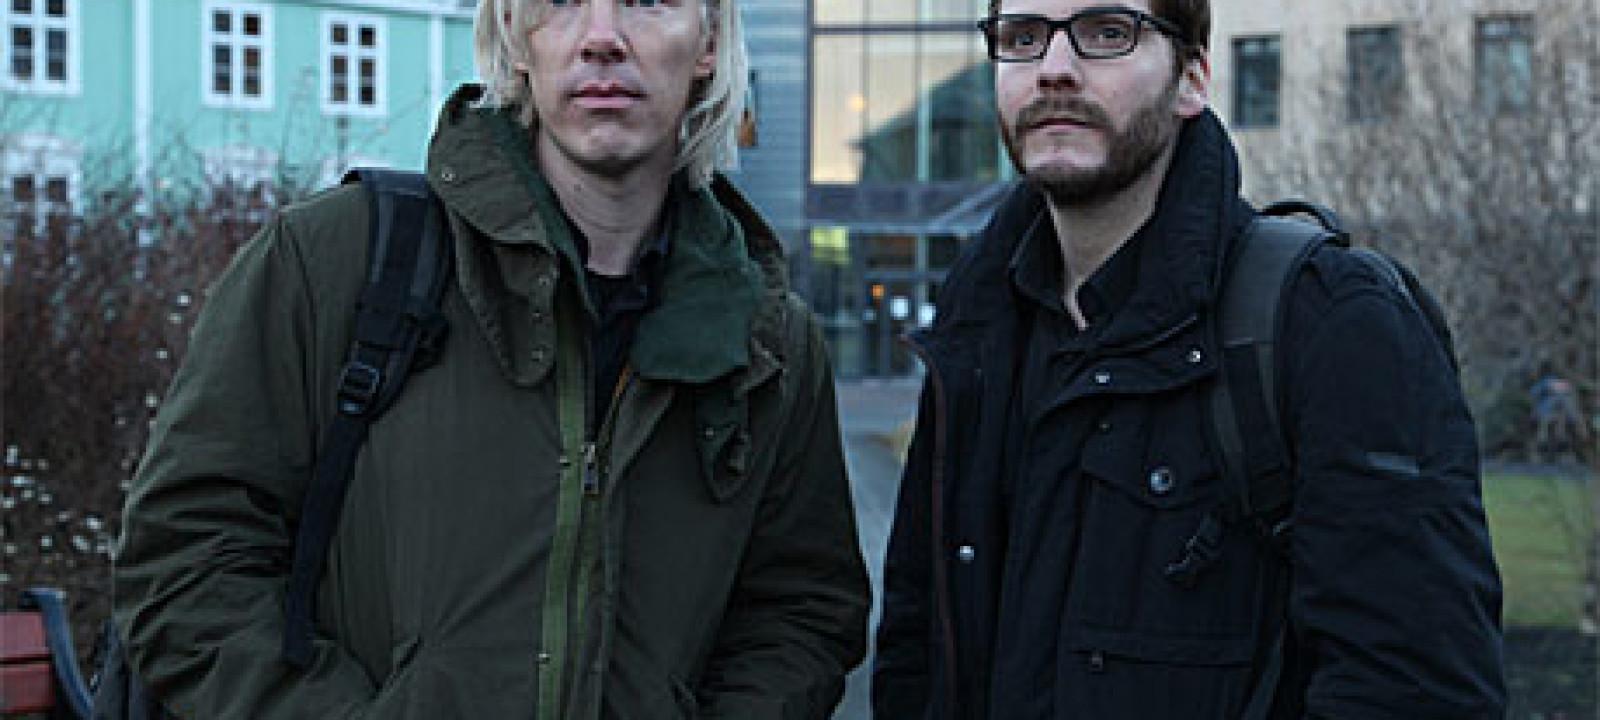 Benedict Cumberbatch as Julian Assange in 'The Fifth Estate'